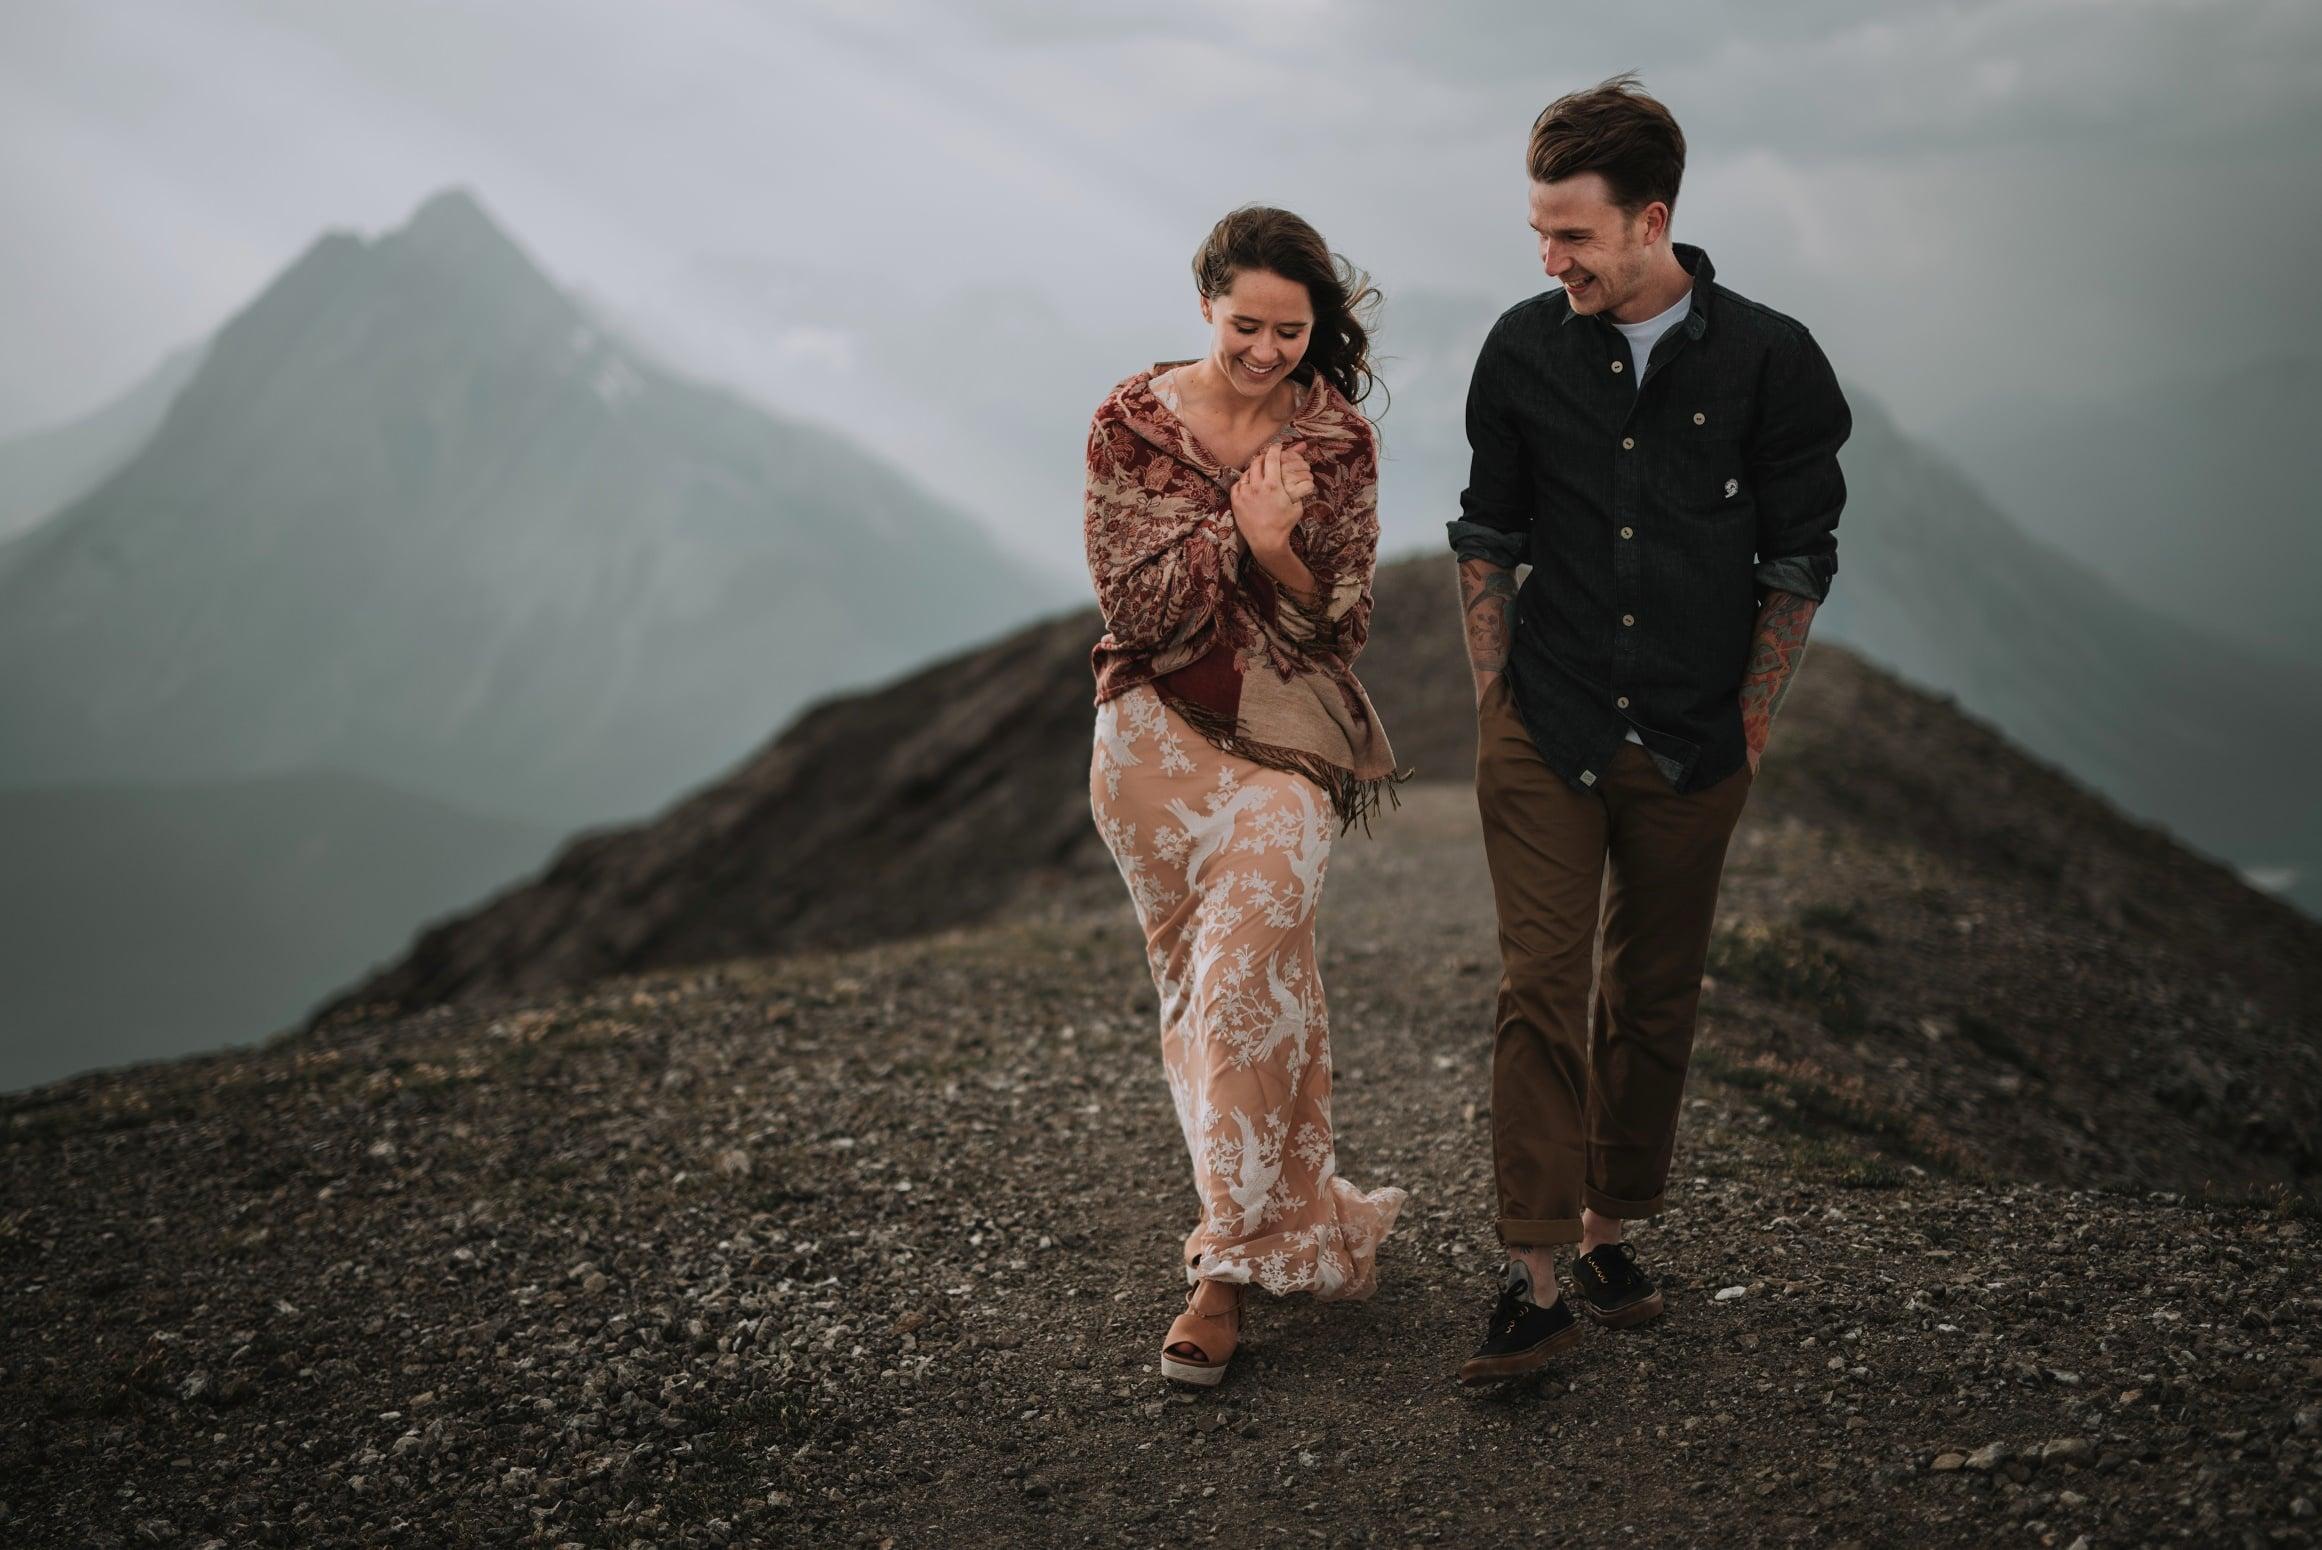 Virginia&Evan-CubeRyan&Frances-Tent-Ridge02